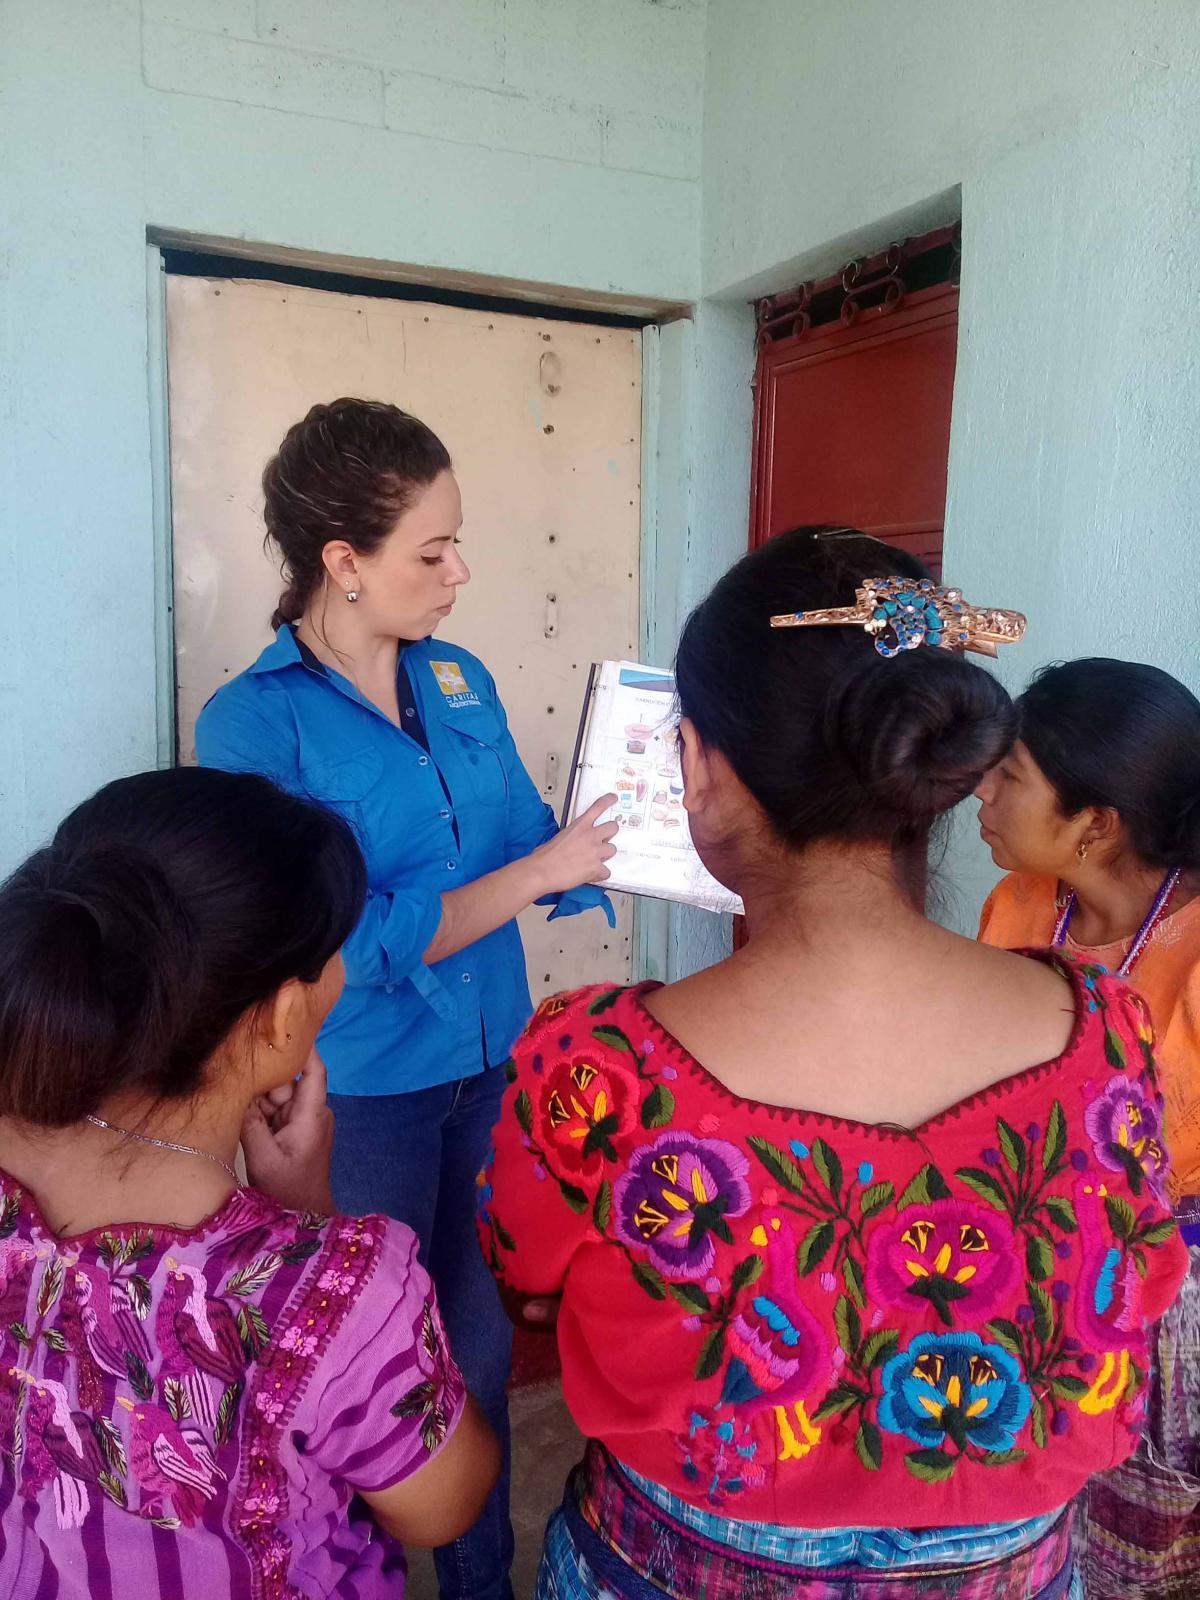 Niños y niñas que padecen desnutrición crónica, son atendidos por Cáritas Arquidiocesana